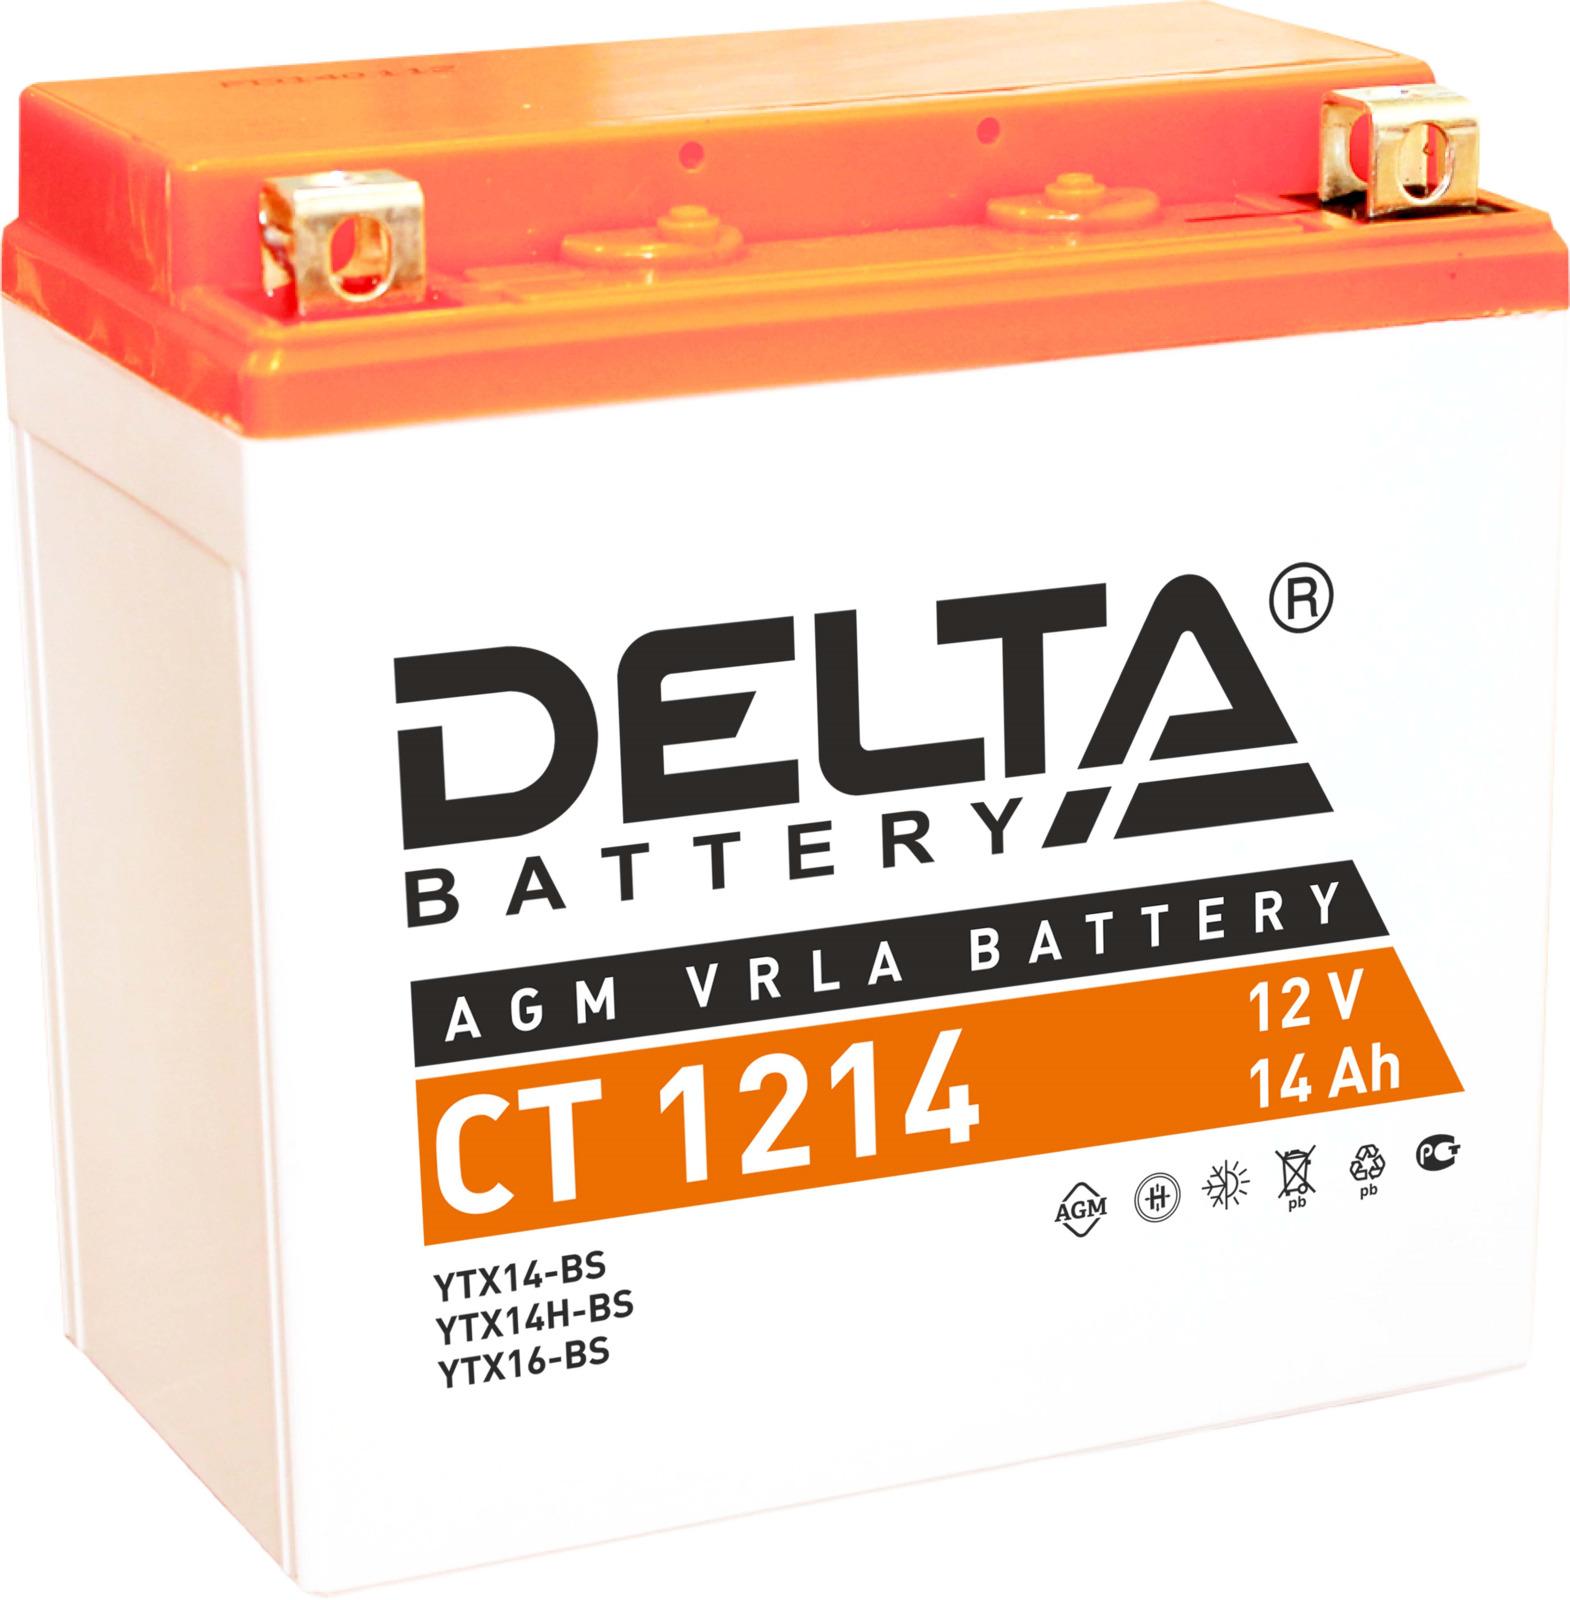 Аккумулятор для мототехники Delta CT 1214 цена